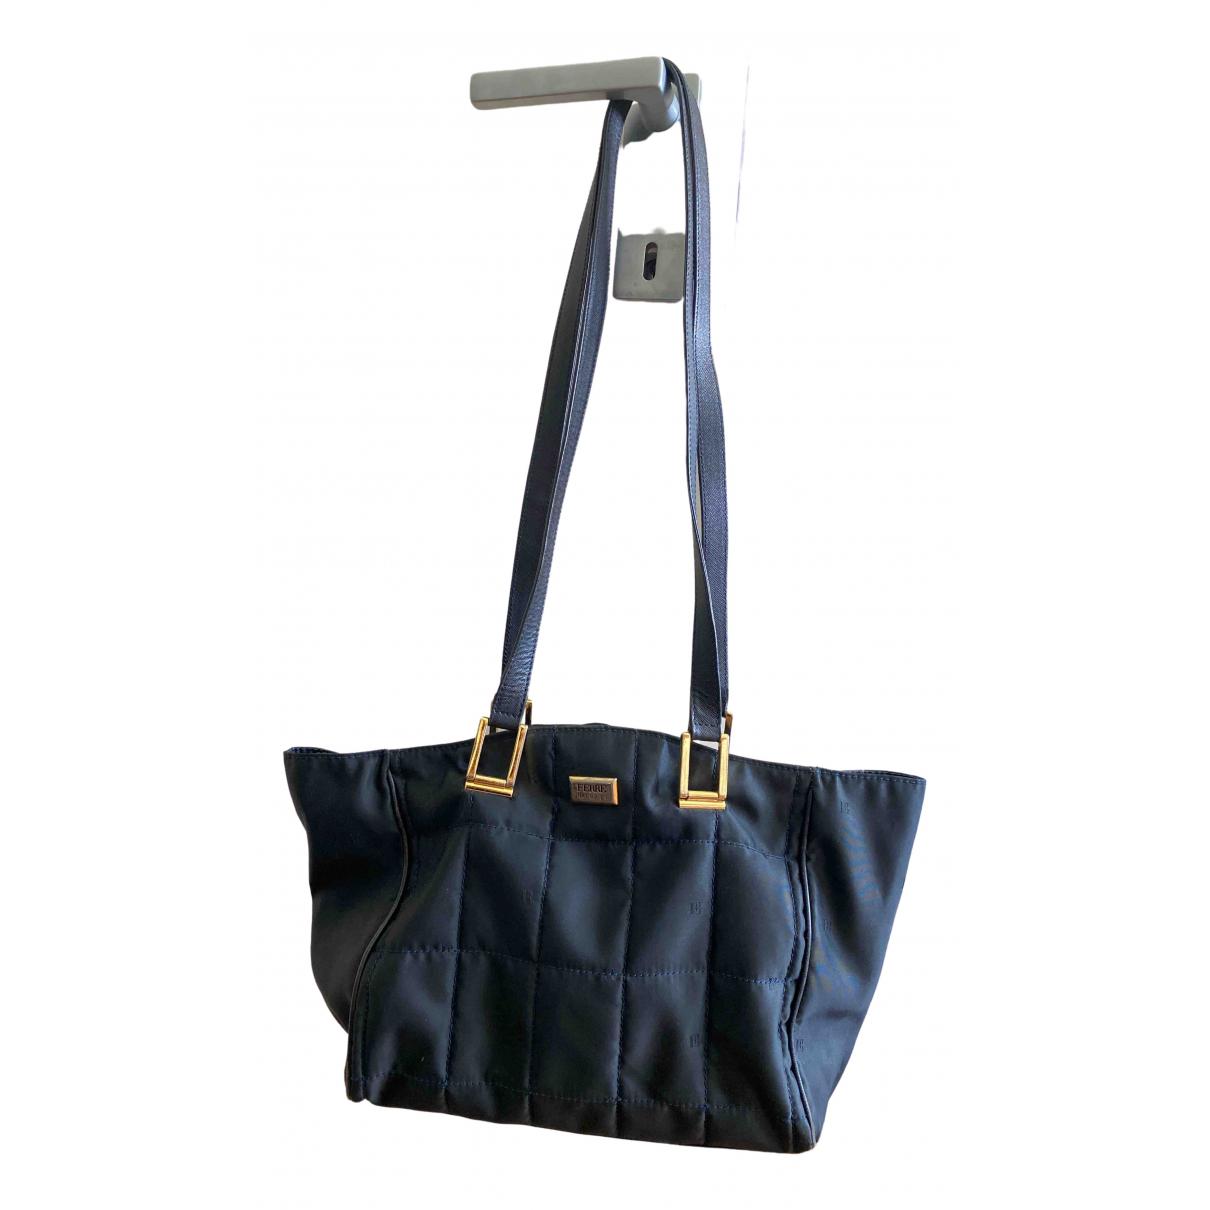 Gianfranco Ferre \N Handtasche in  Blau Polyester